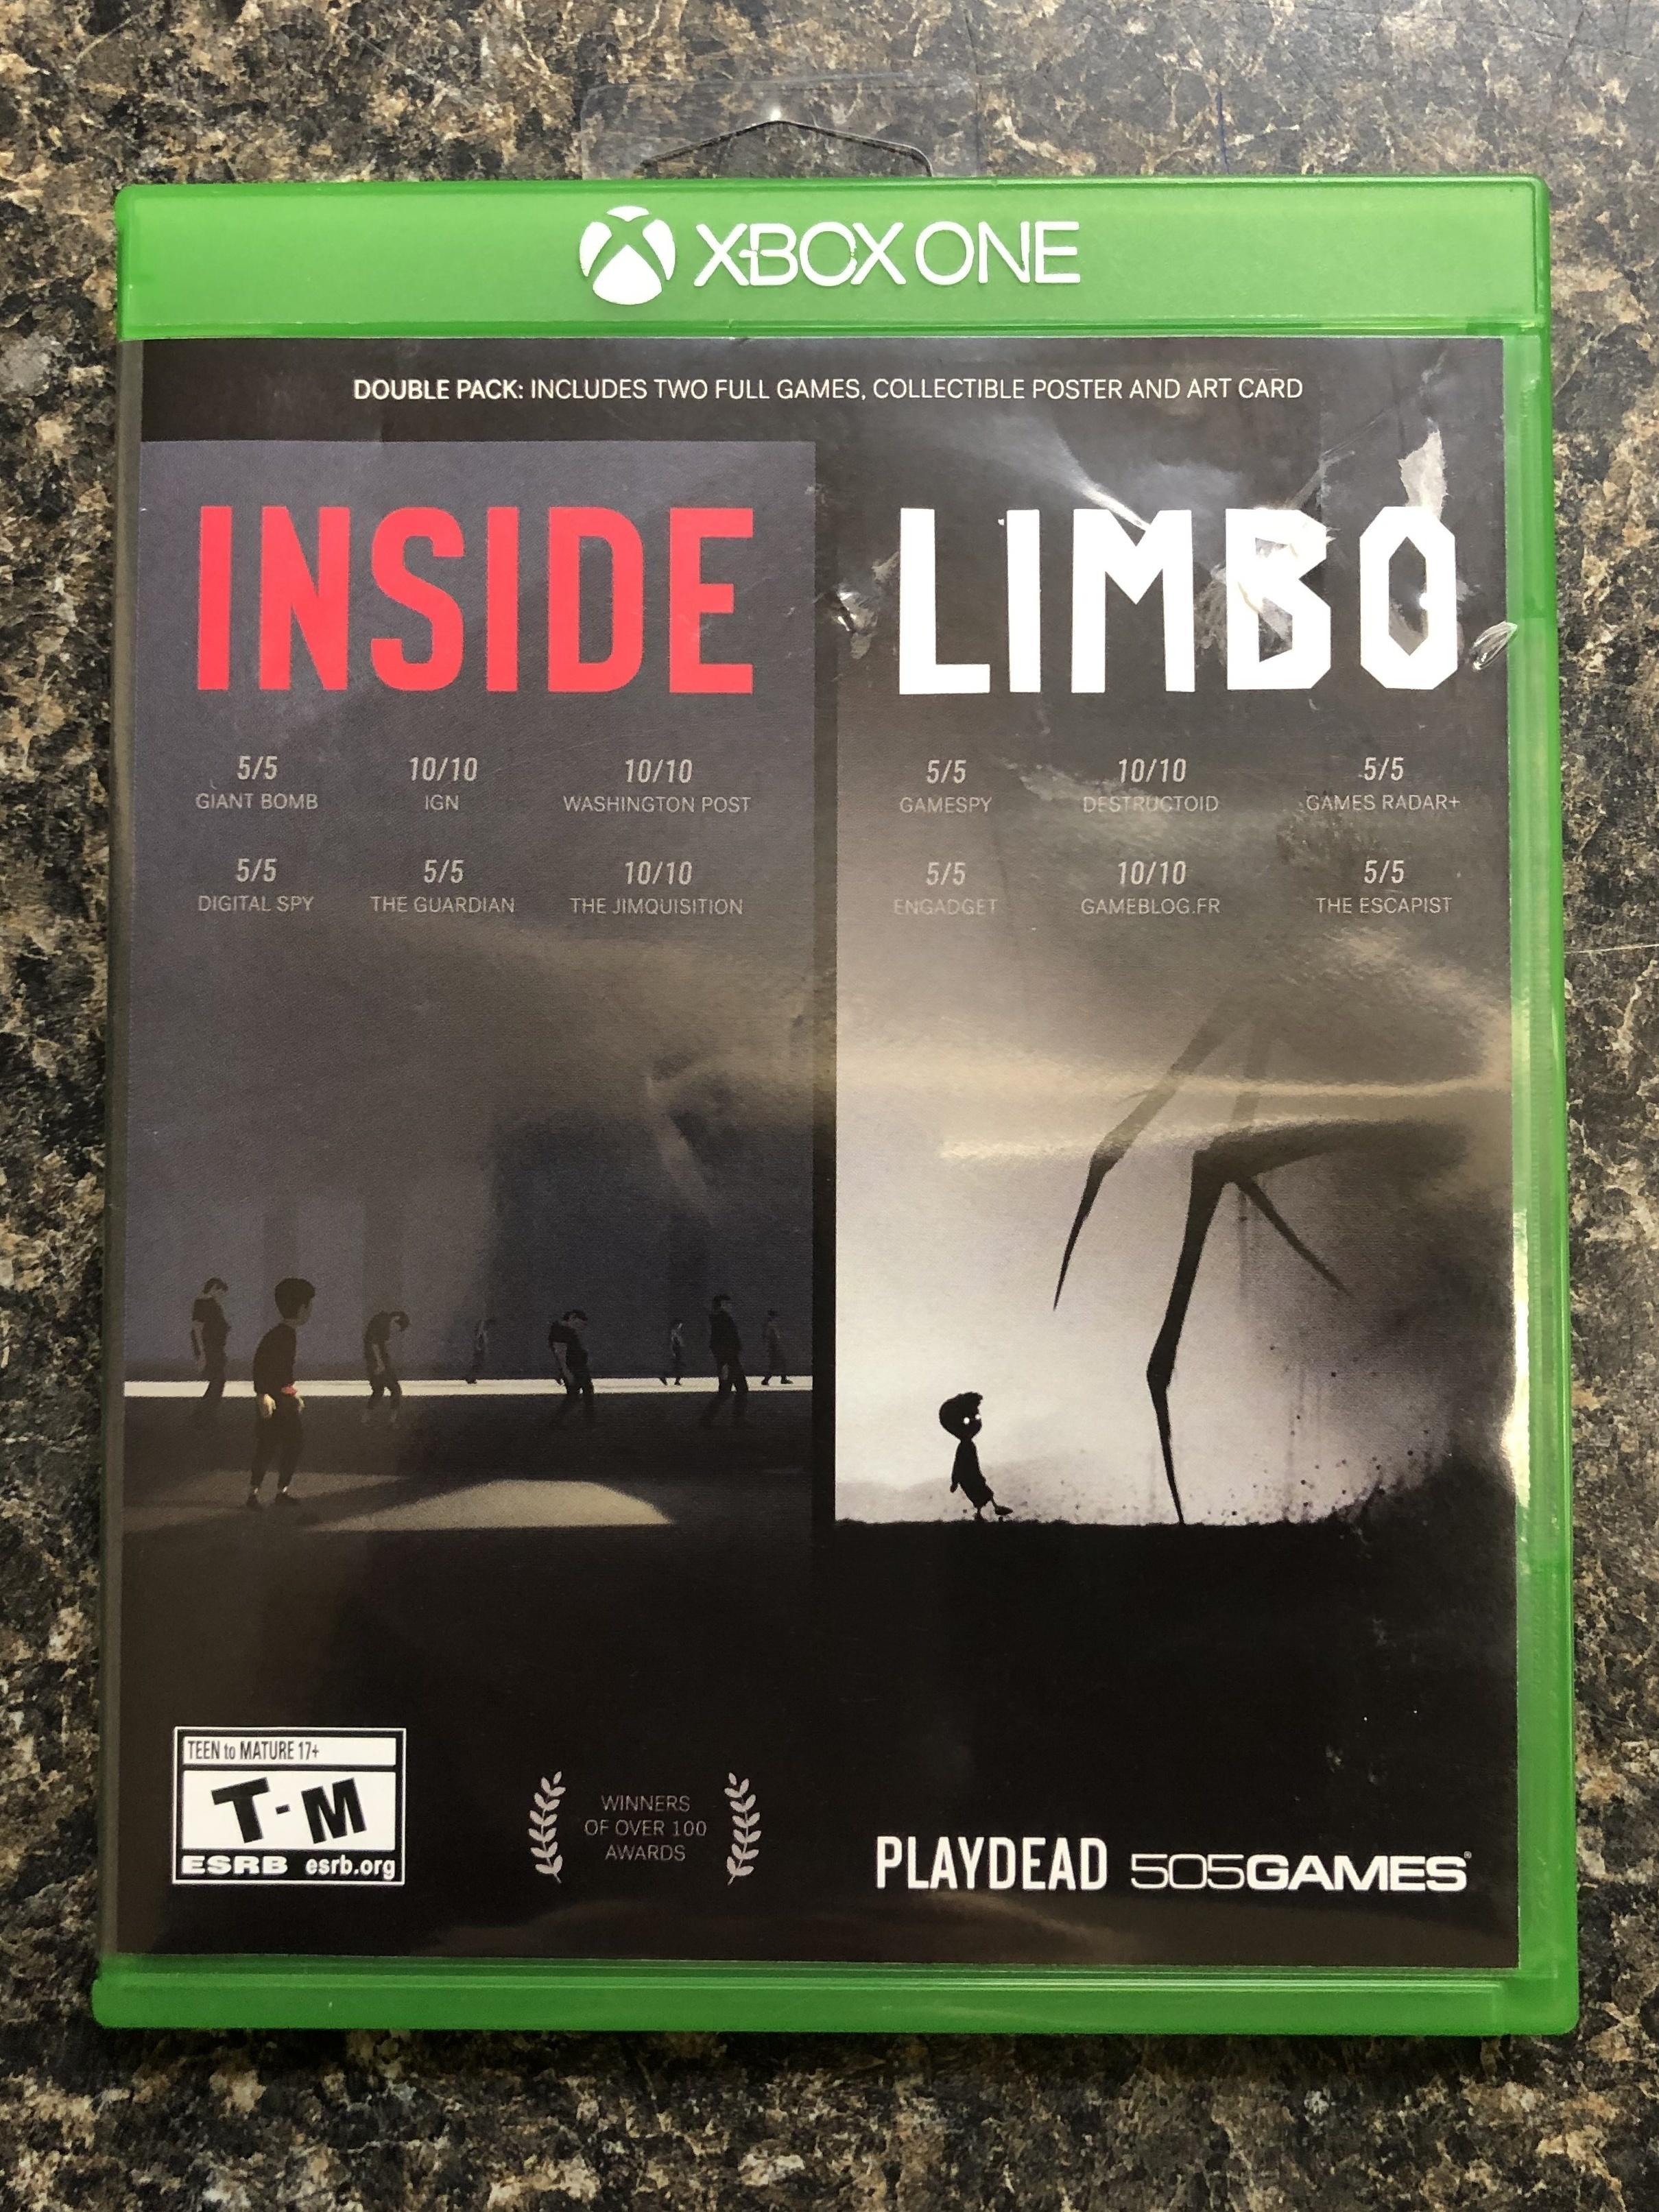 INSIDE LIMBO - XBOX ONE GAMES